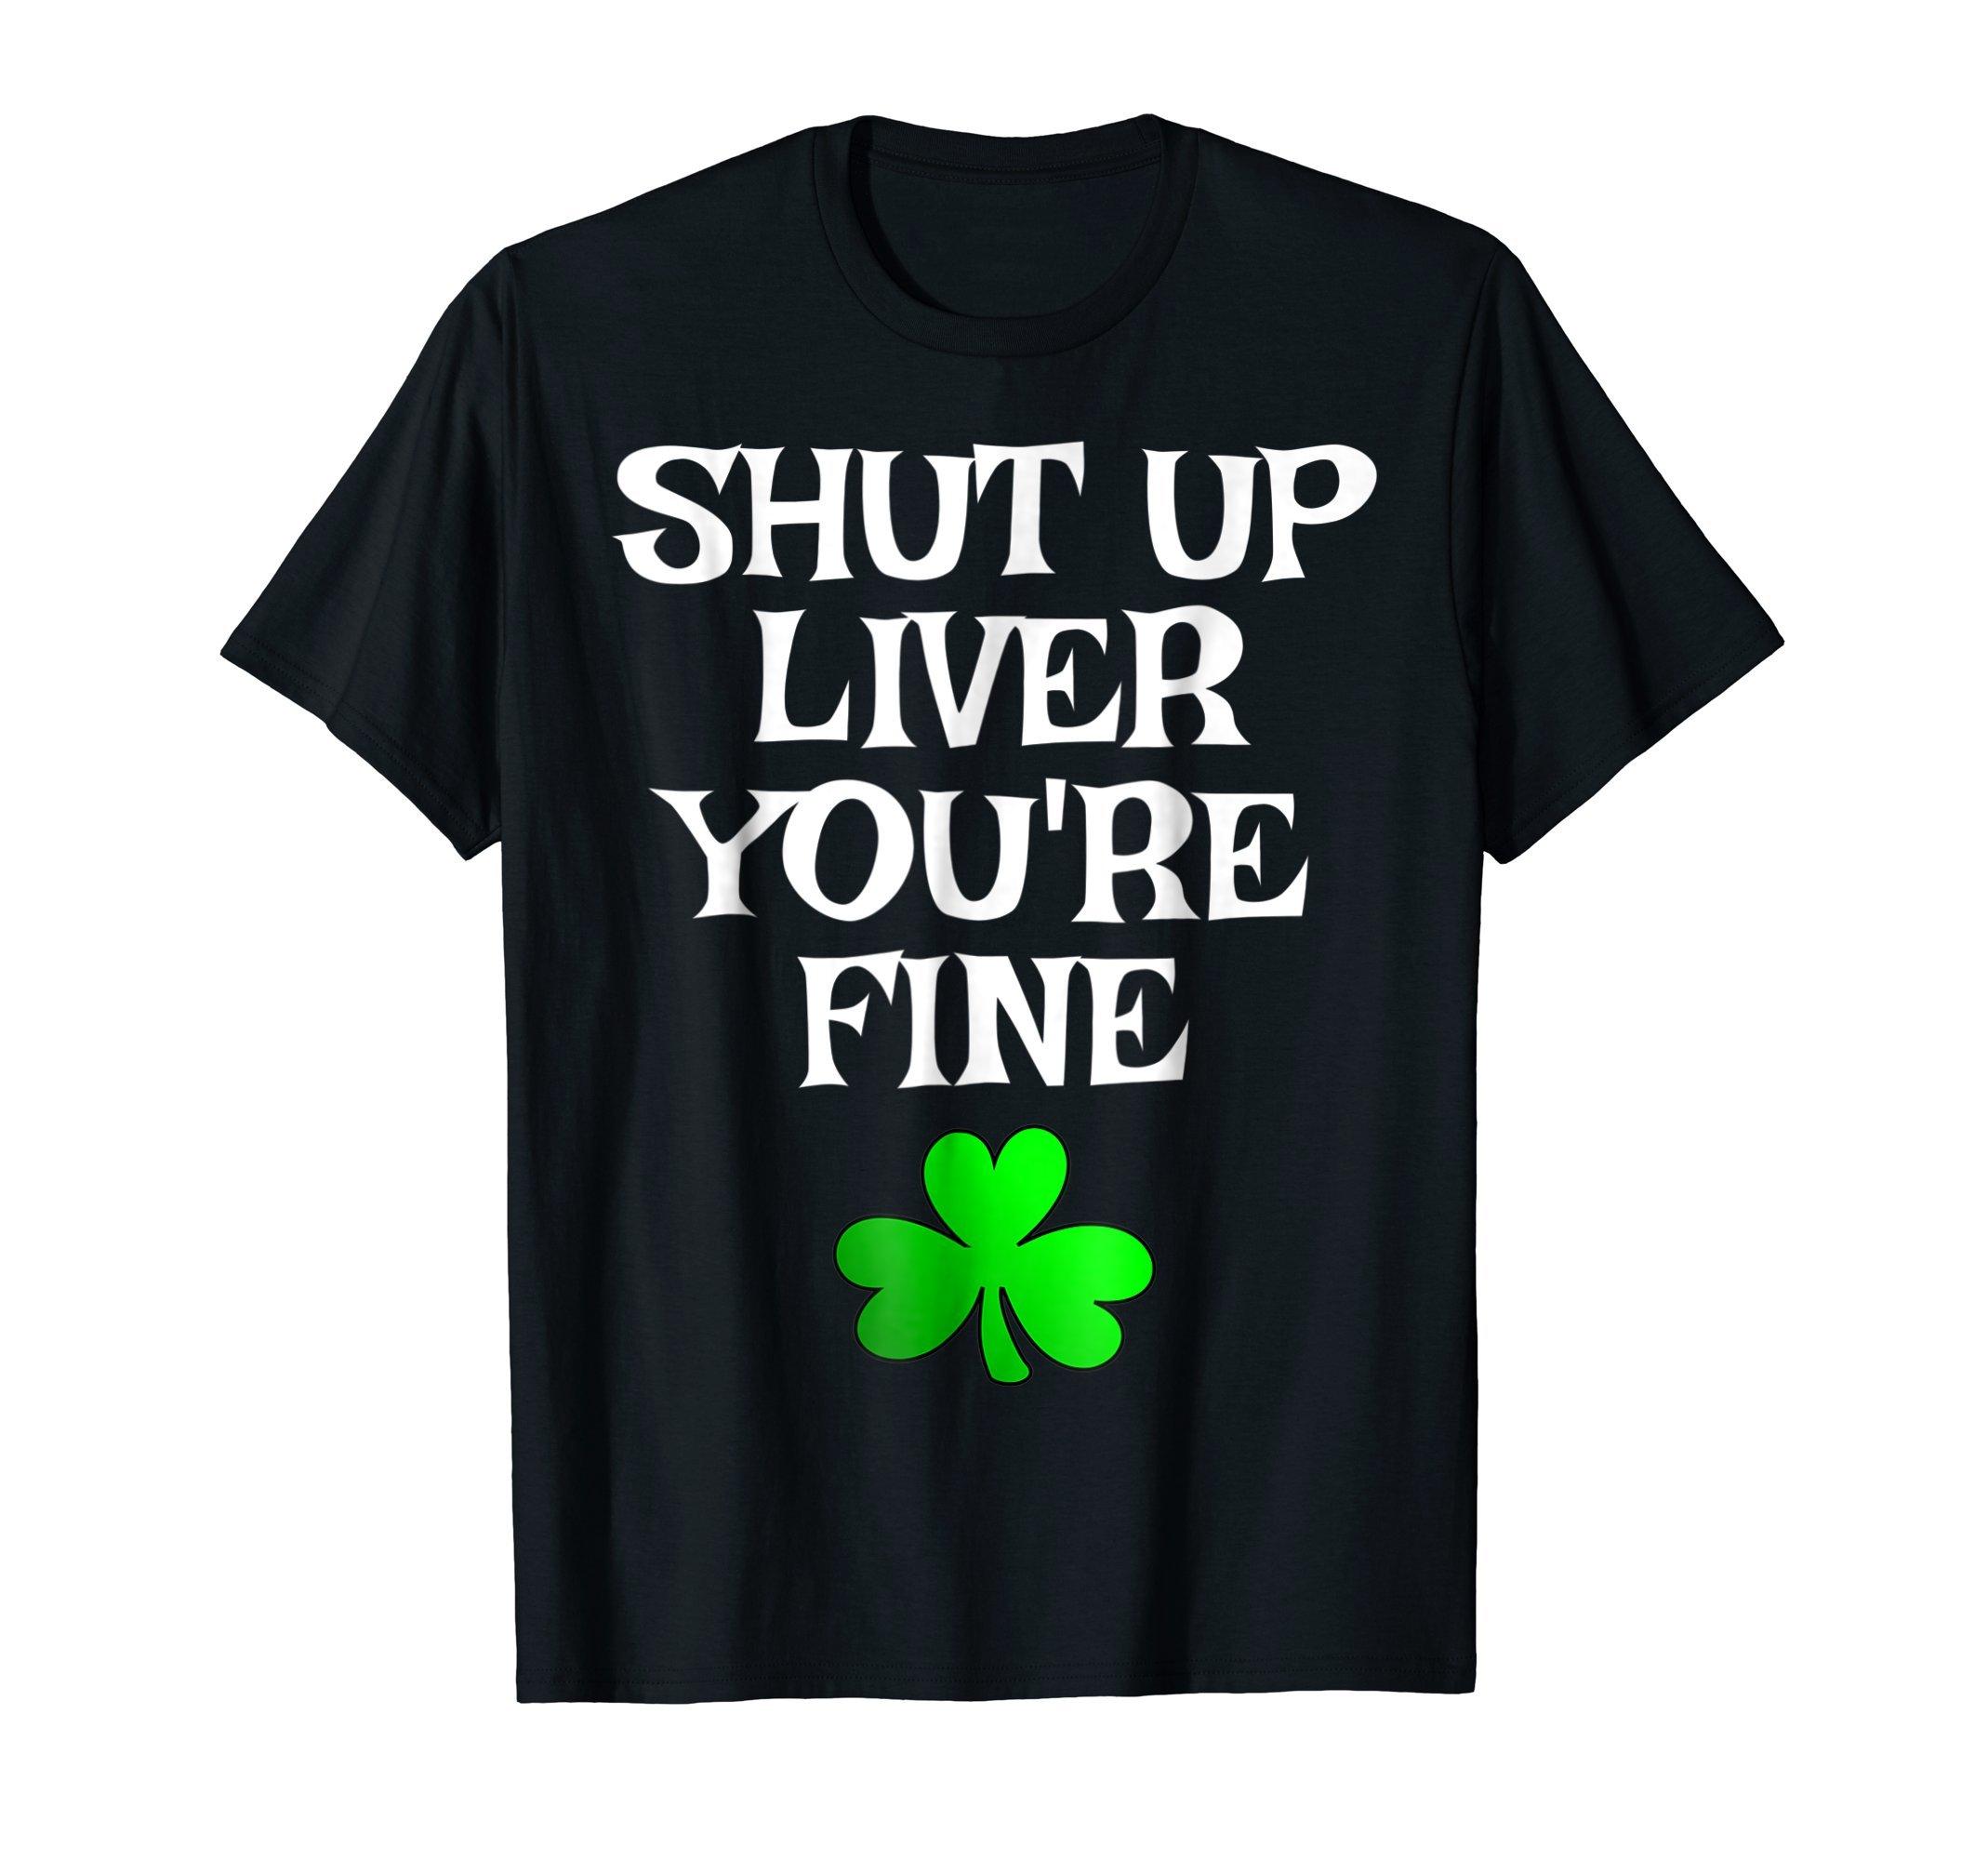 Shut Up Liver You're Fine Funny Saint Patrick's Day T-Shirt